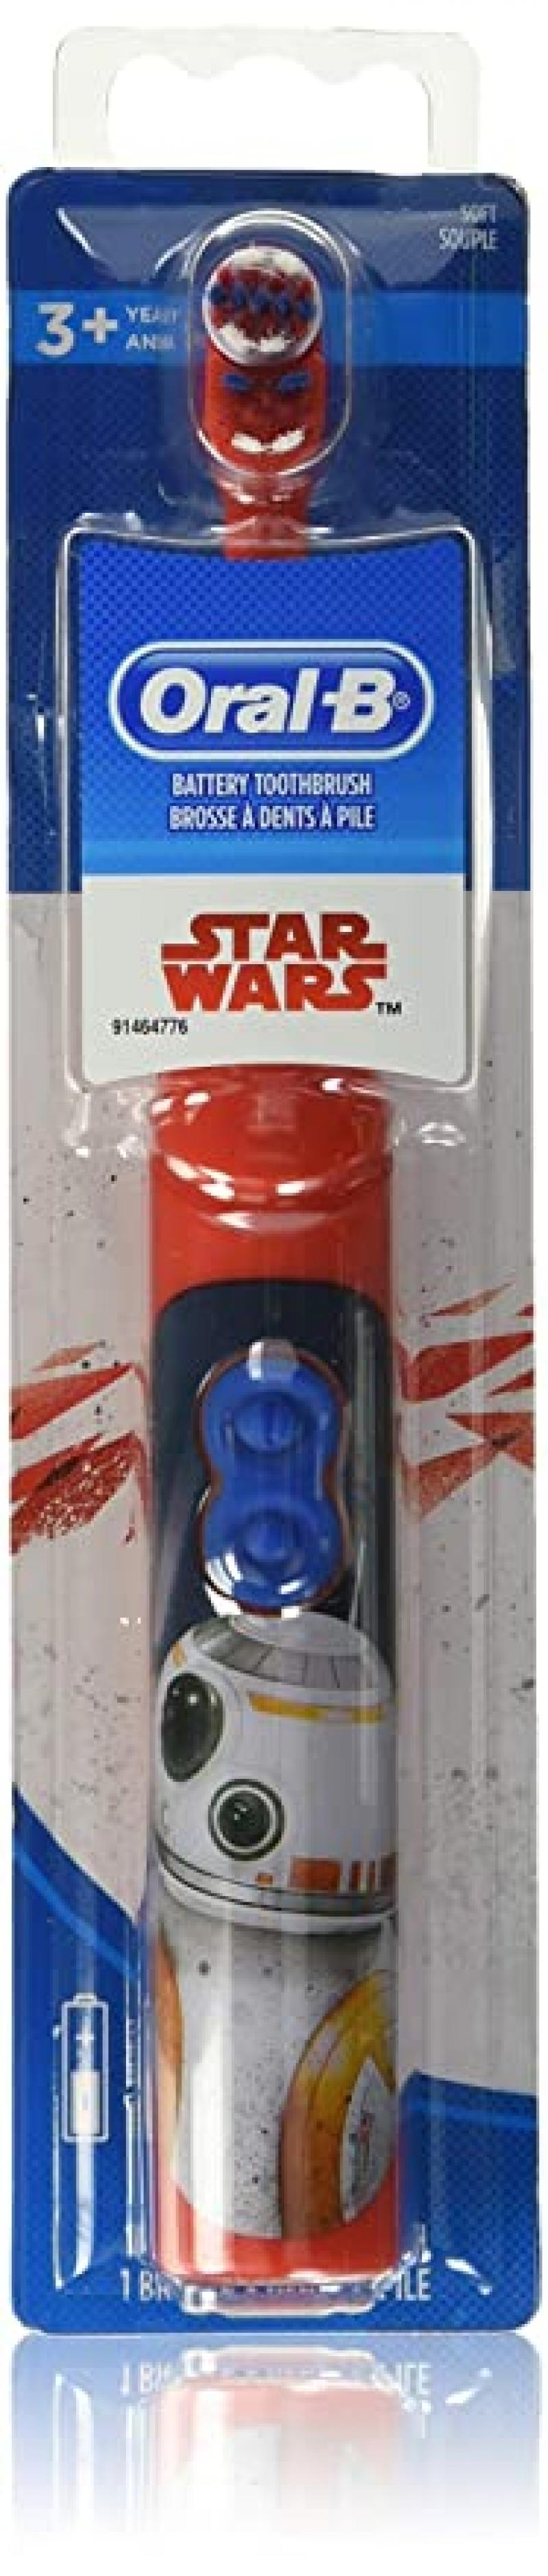 ihocon: Oral-B Disney STAR WARS Kids Battery Powered Electric Toothbrush 兒童電動牙刷(使用電池)